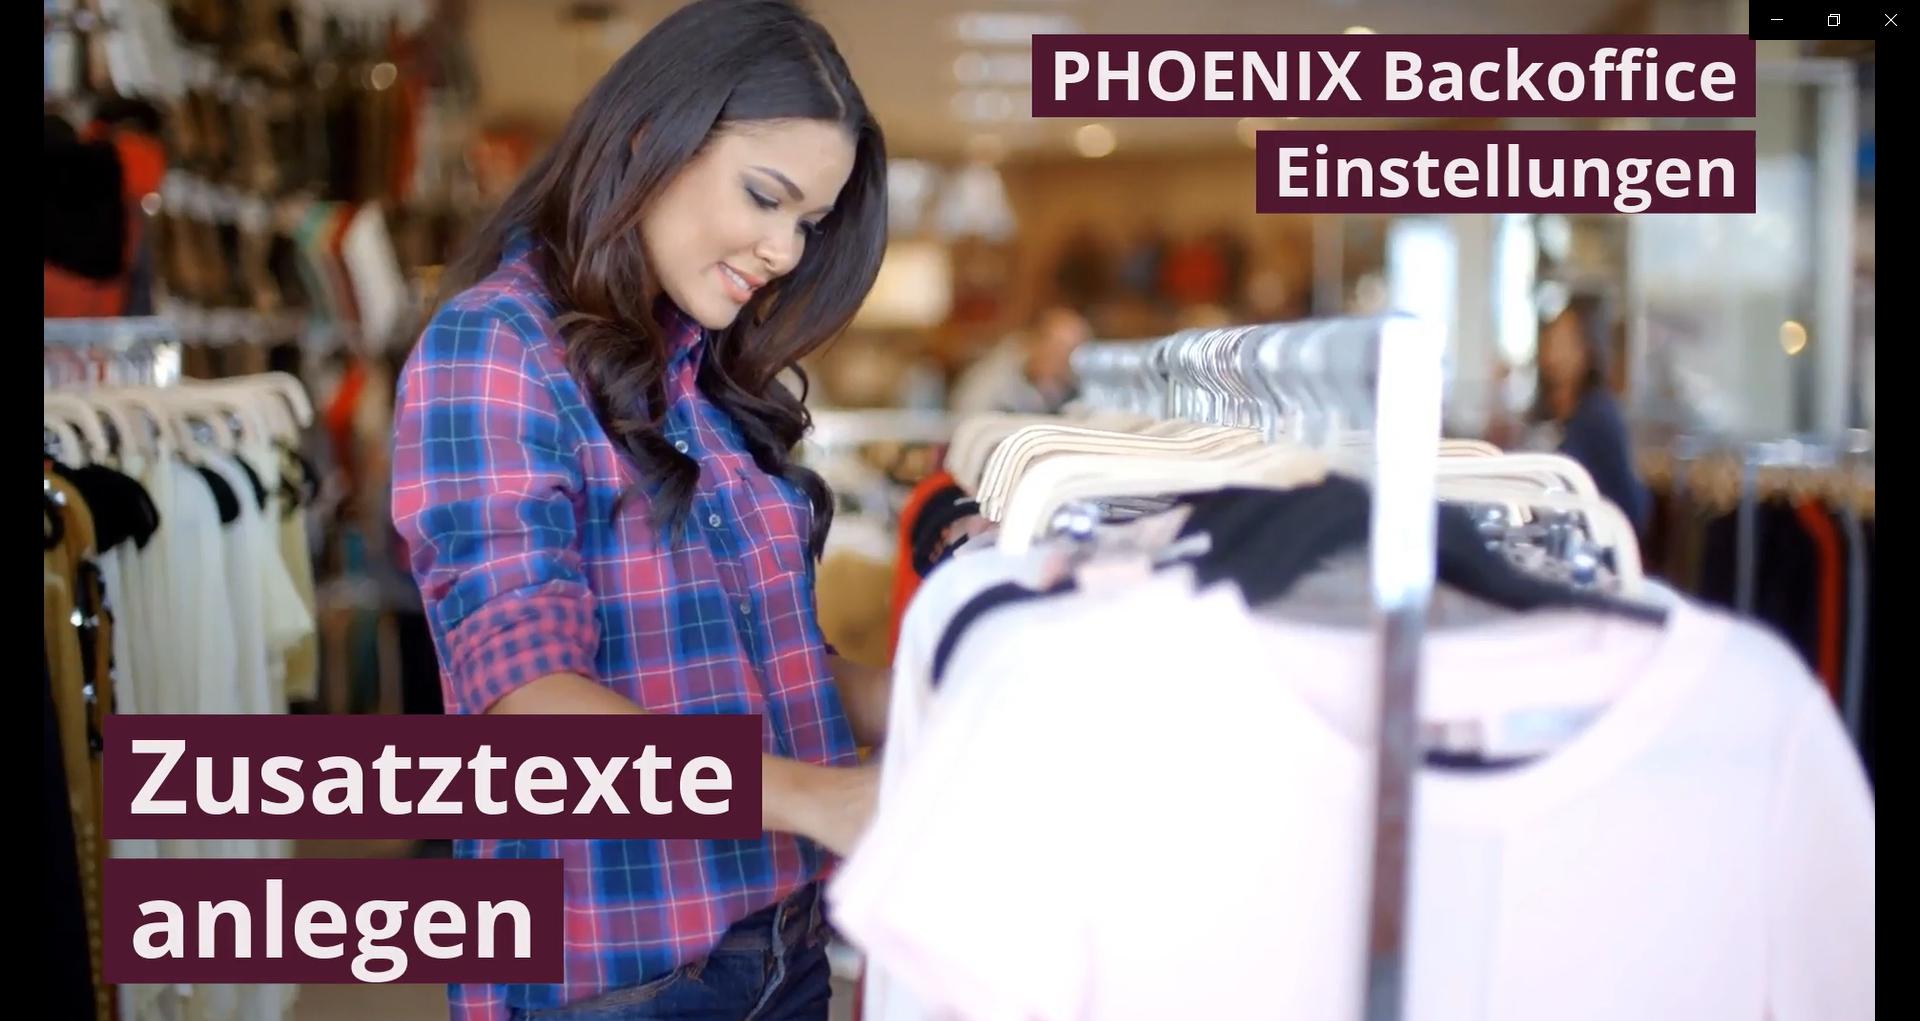 PHOENIX Feature - Zusatztexte